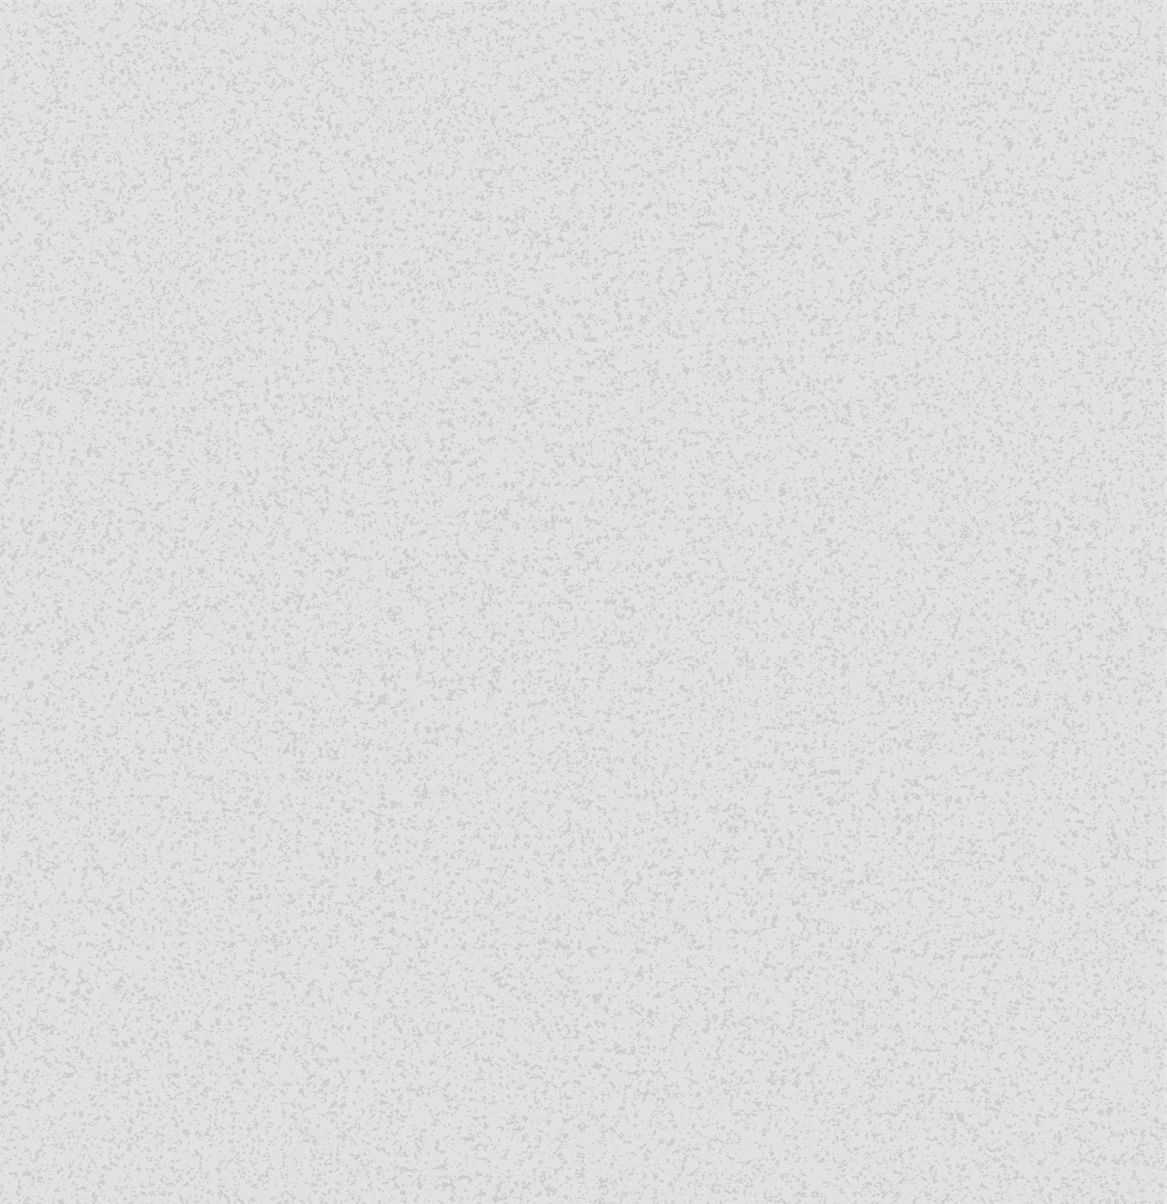 Papel de Parede Modern Maison Aspecto Cimentado MM558003 - Rolo: 10m x 0,52m